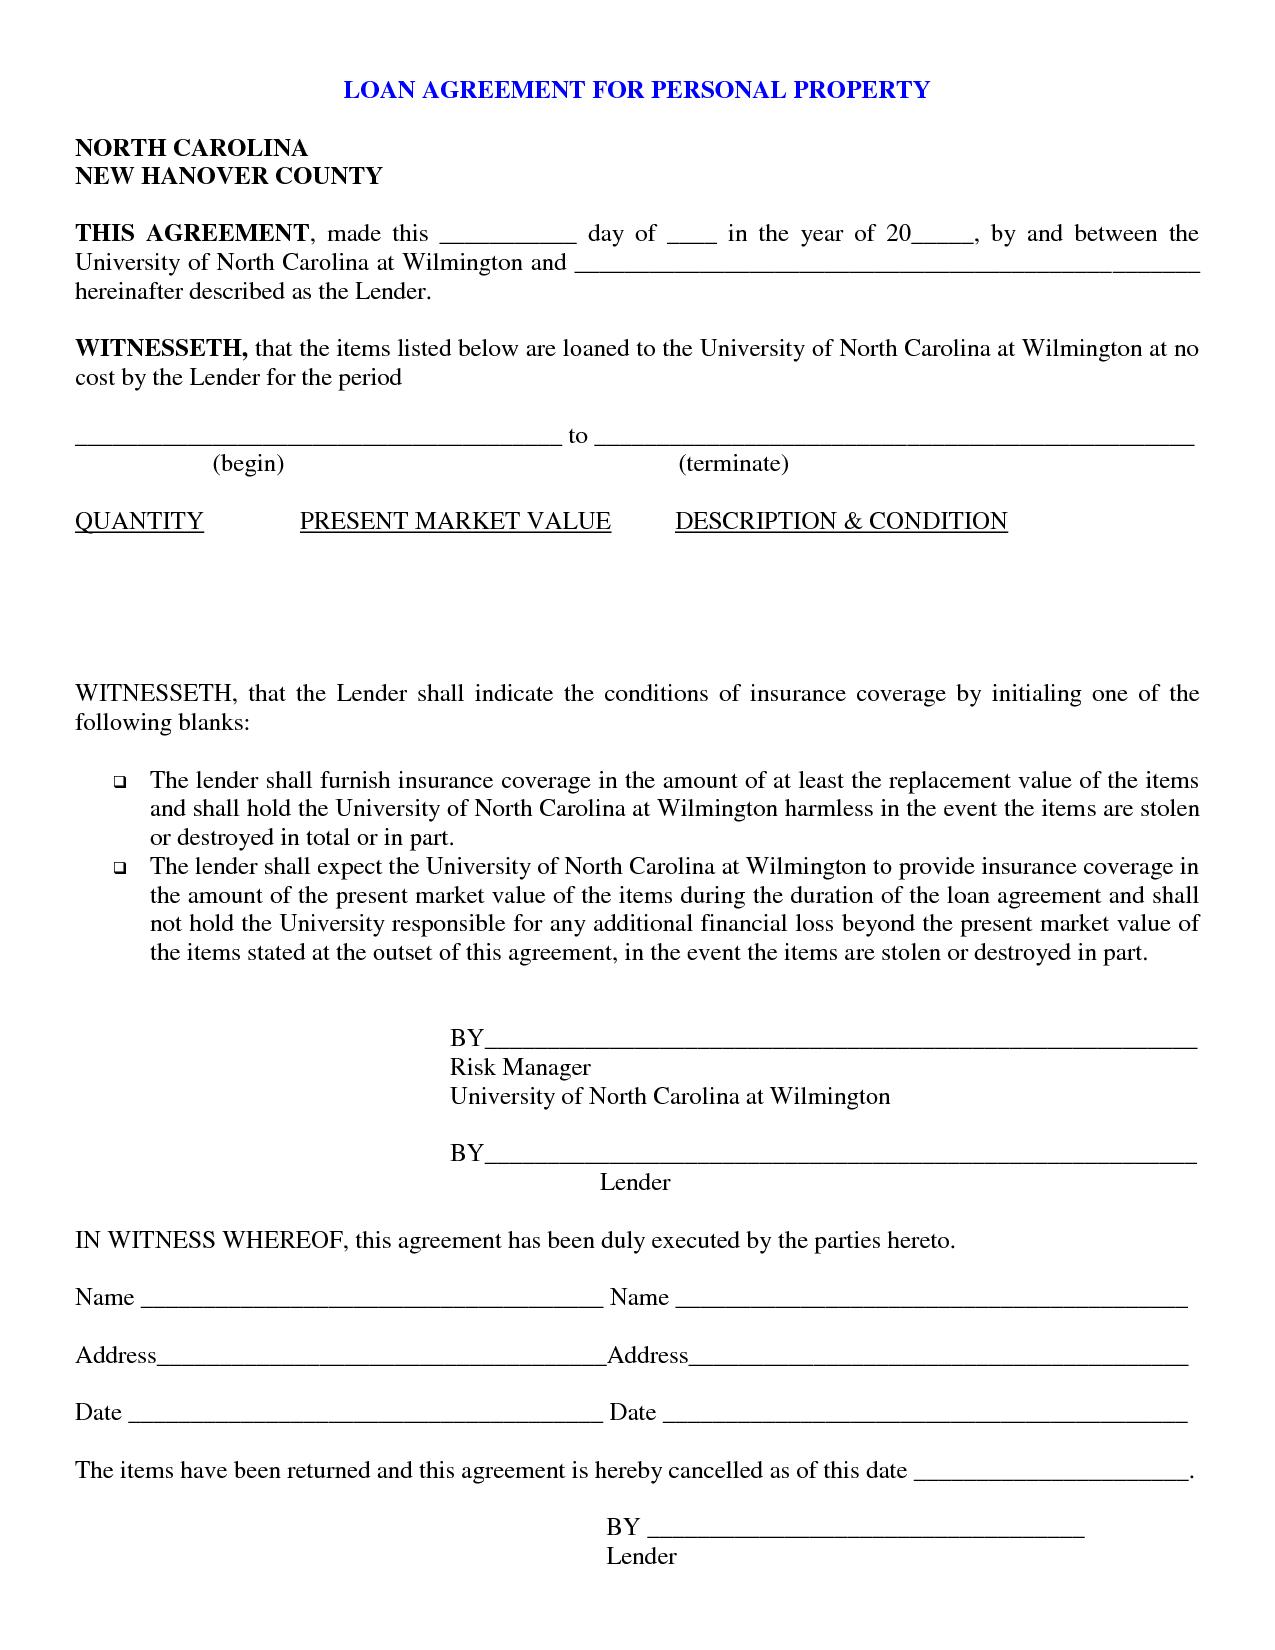 /docs-Business-Loan-Agreement